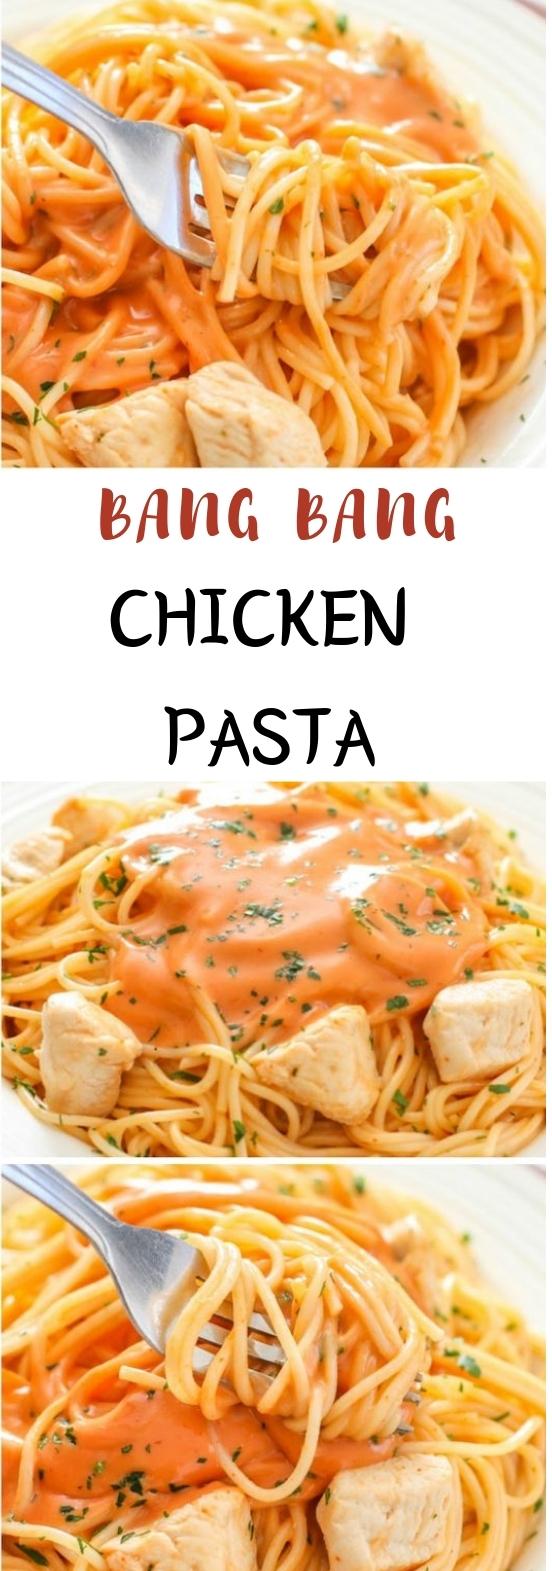 Bang Bang Chicken Pasta #pasta #dinner